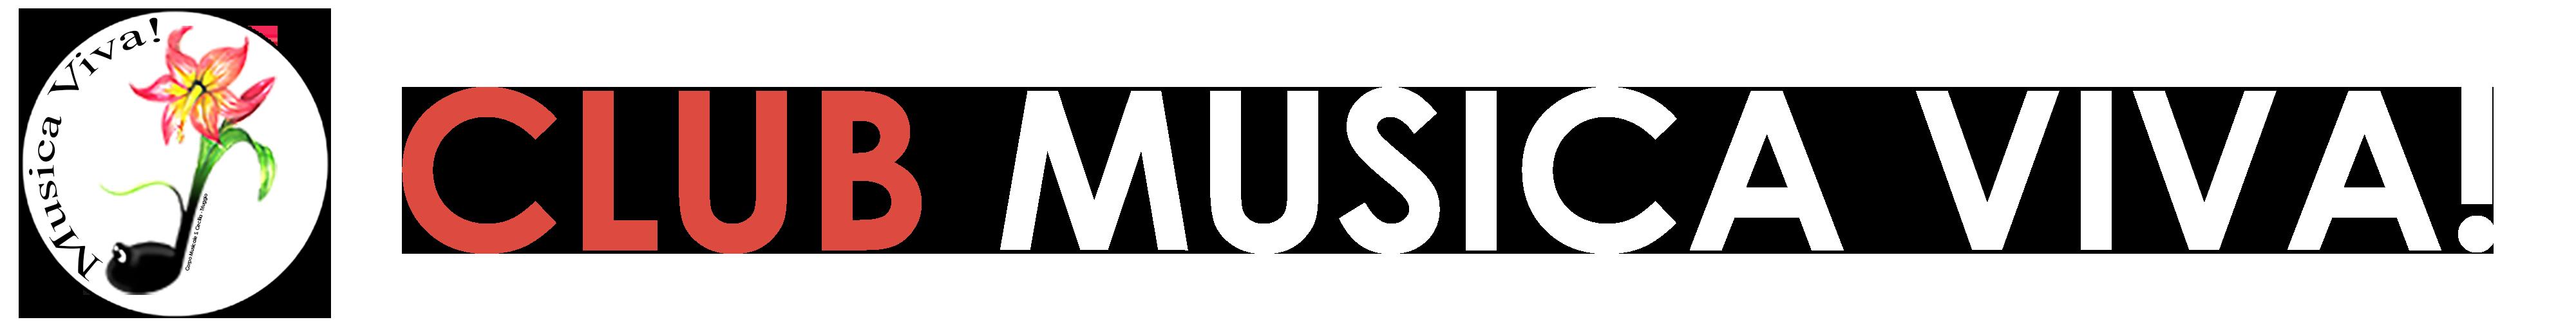 Club Culturale Musica Viva